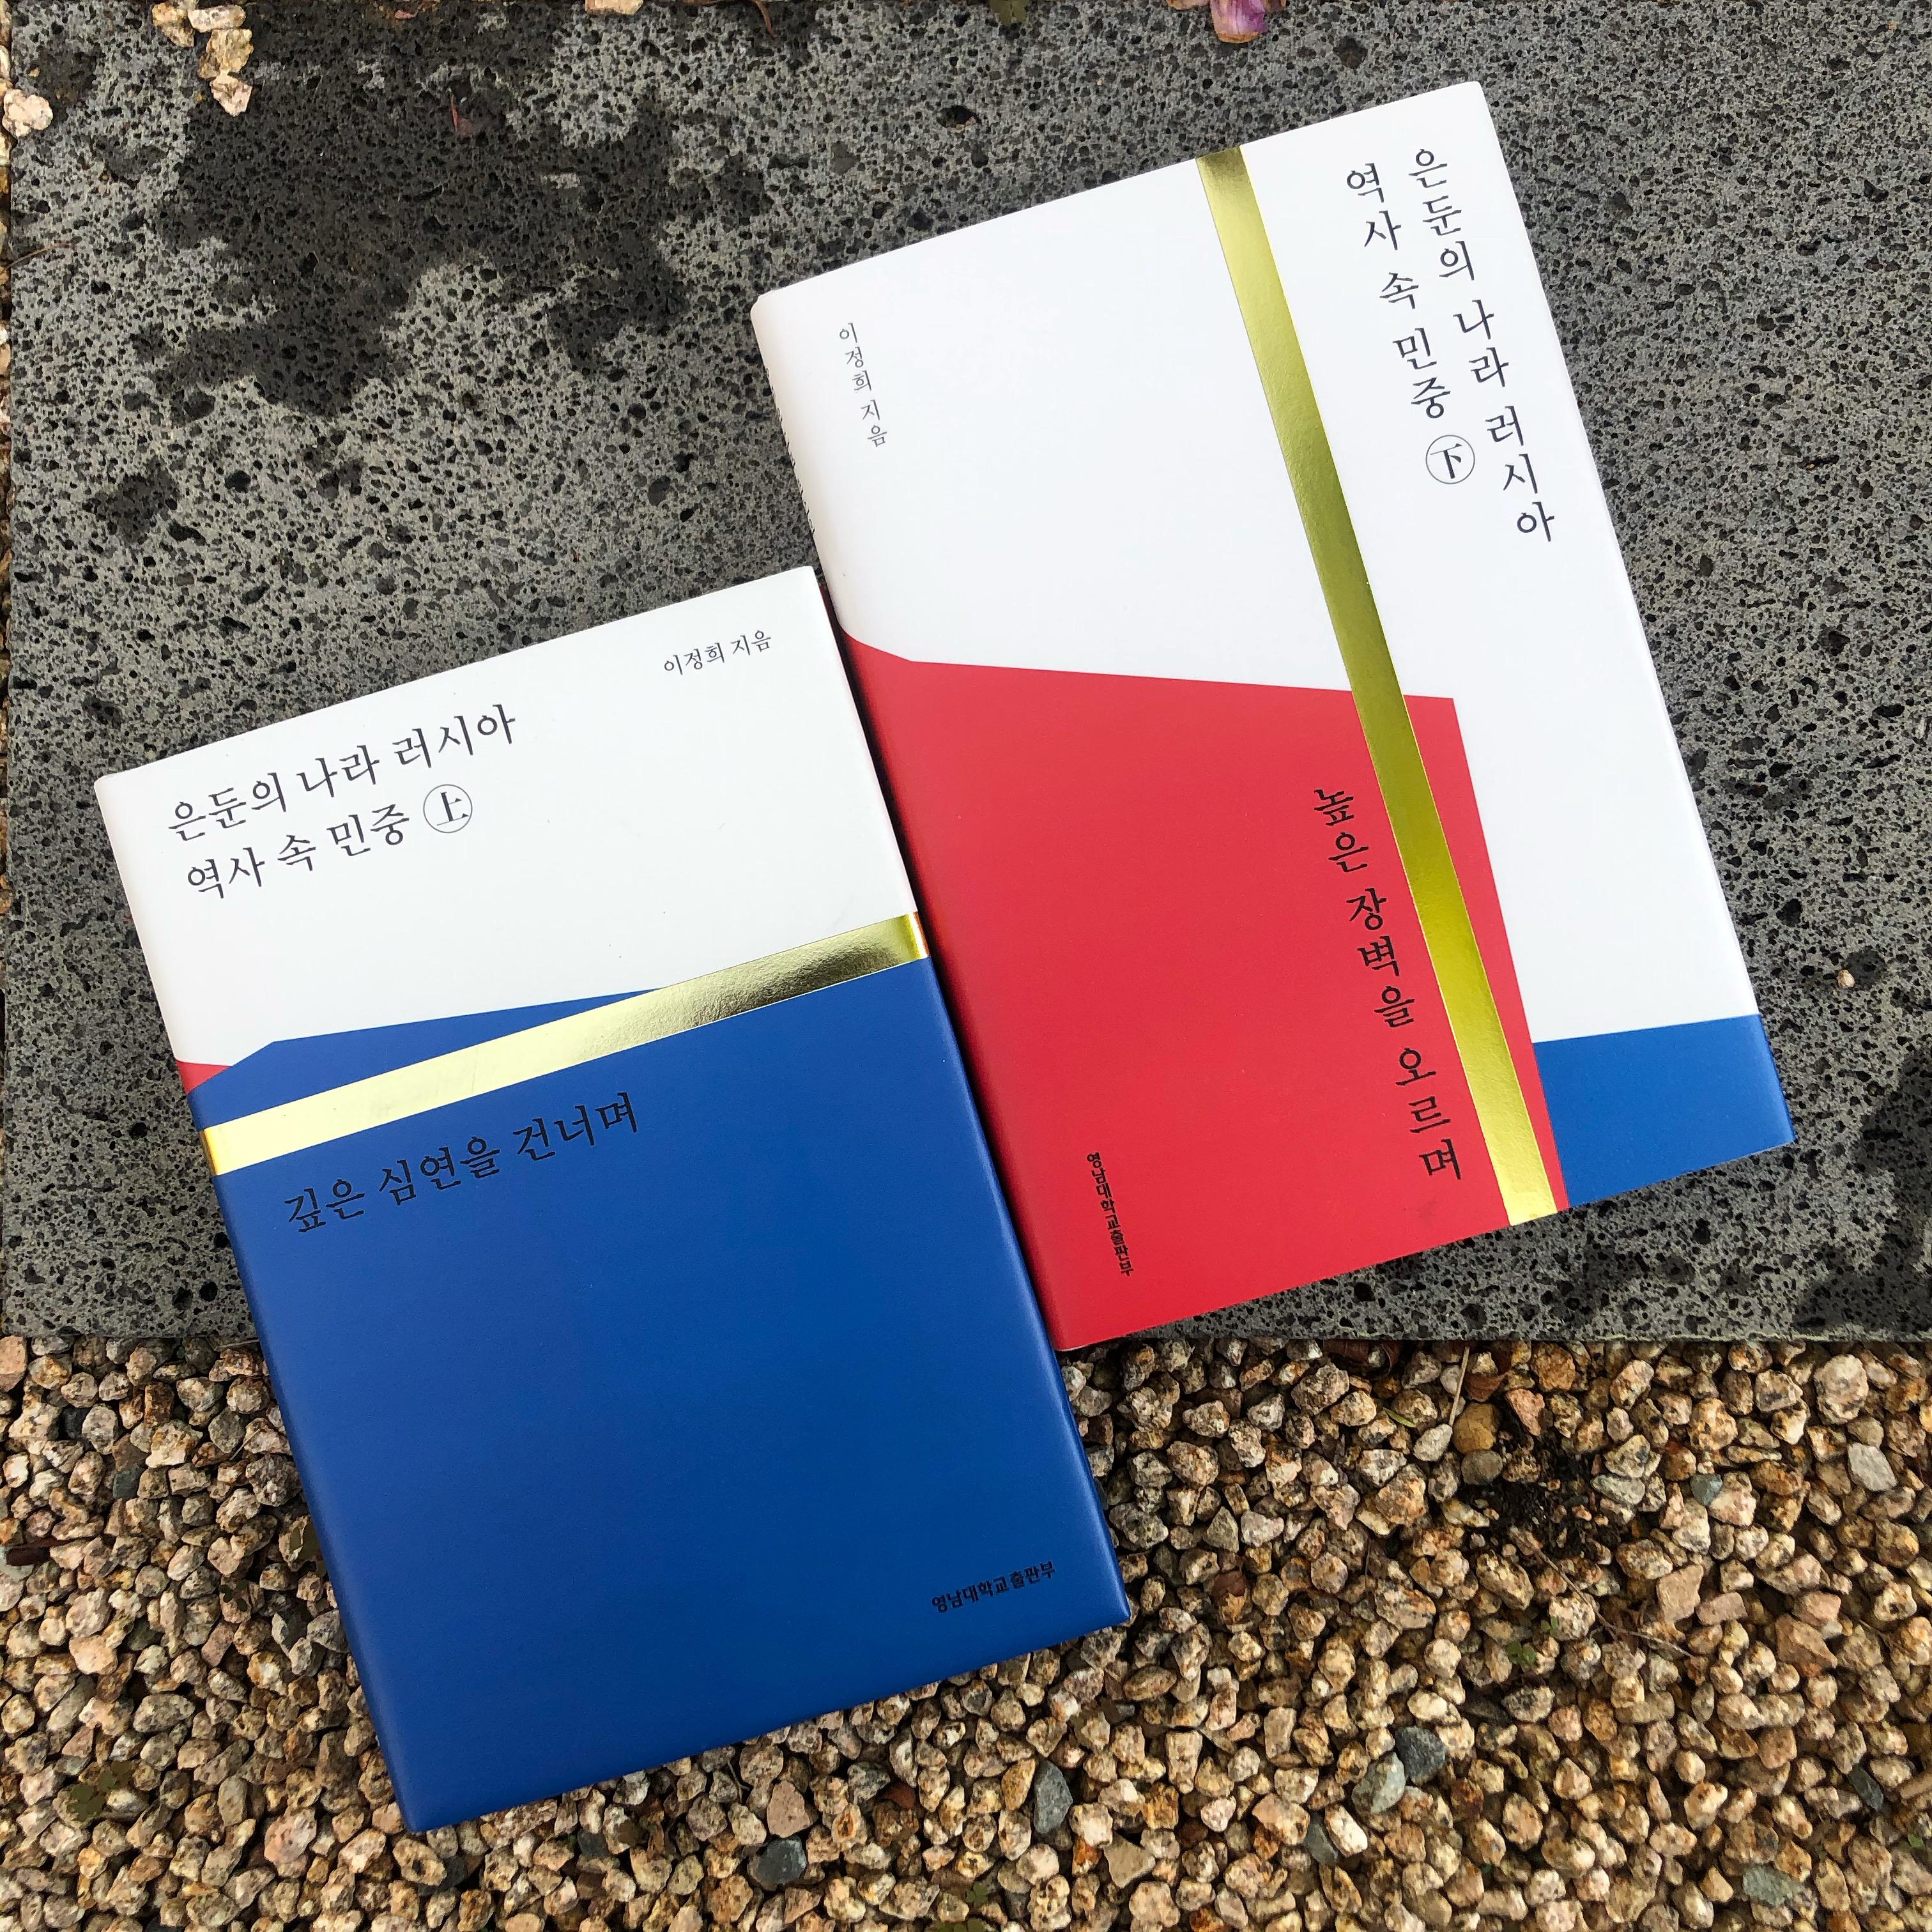 Book design. 은둔의 나라 러시아 (상/하)